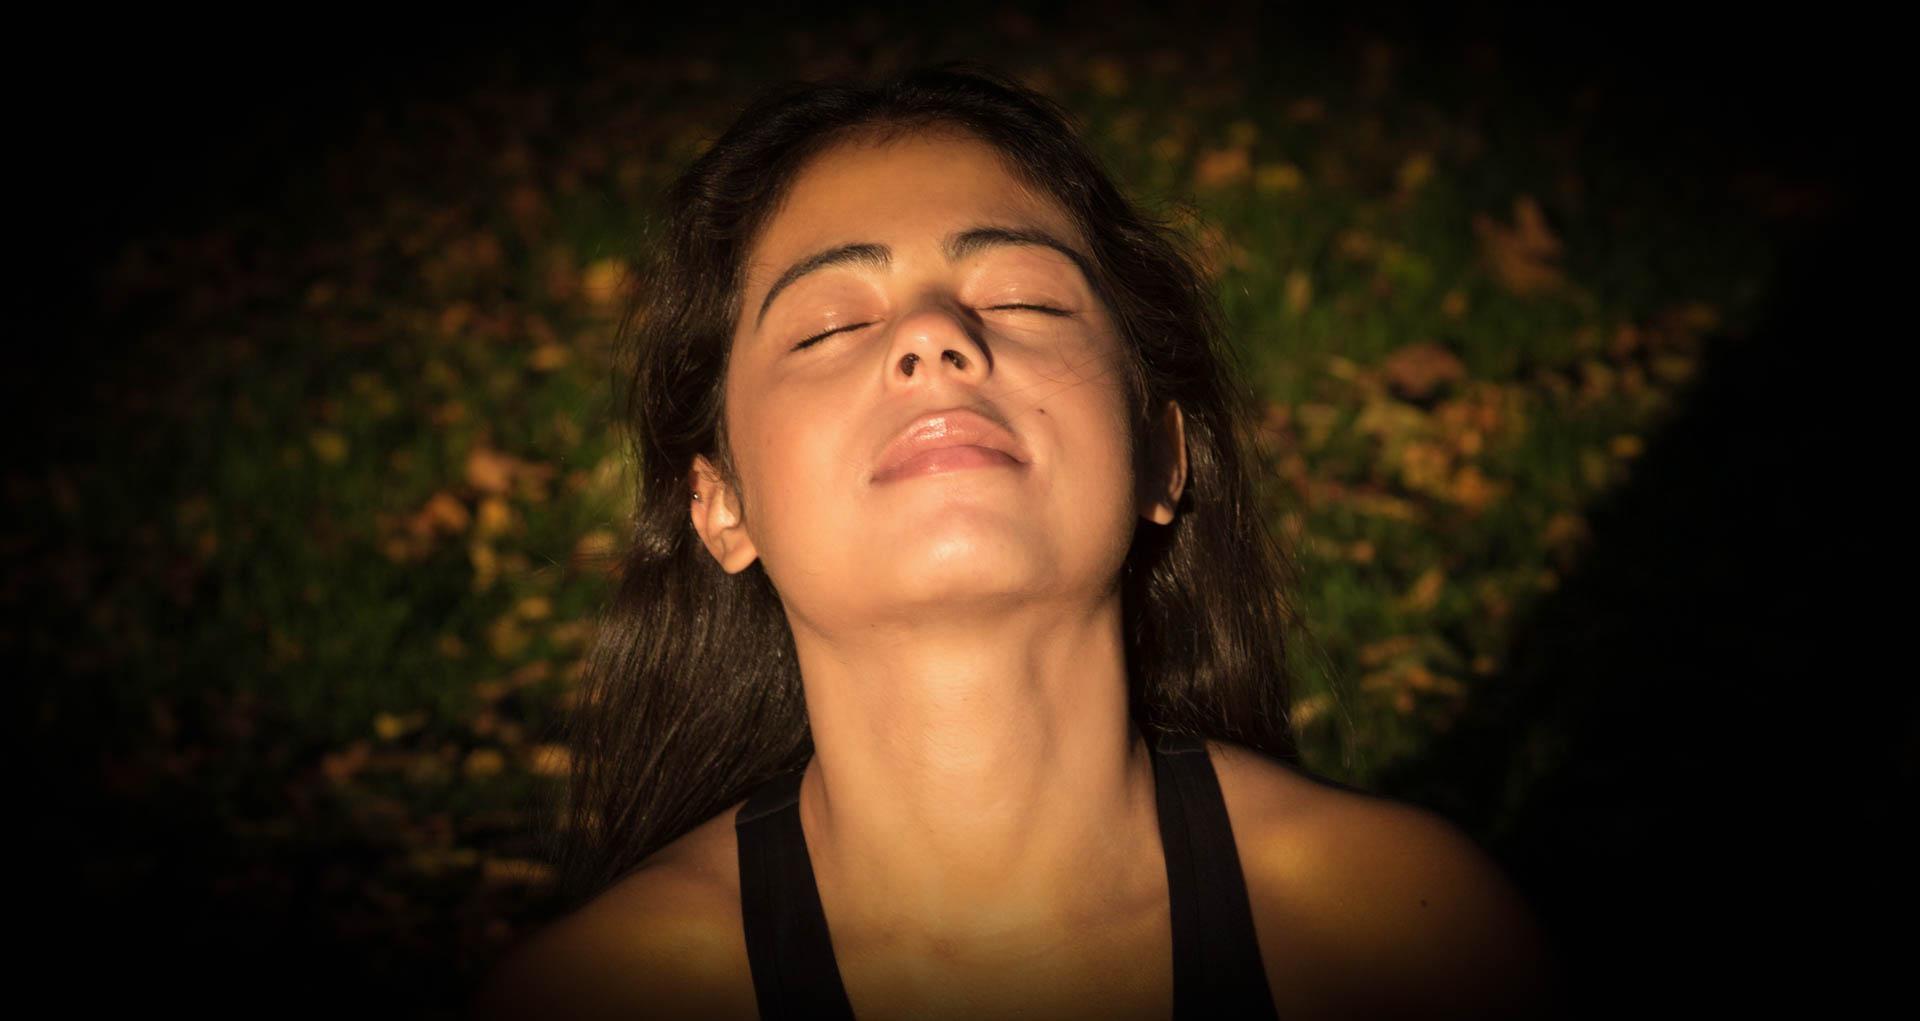 What Mel Did - Morgan meditation